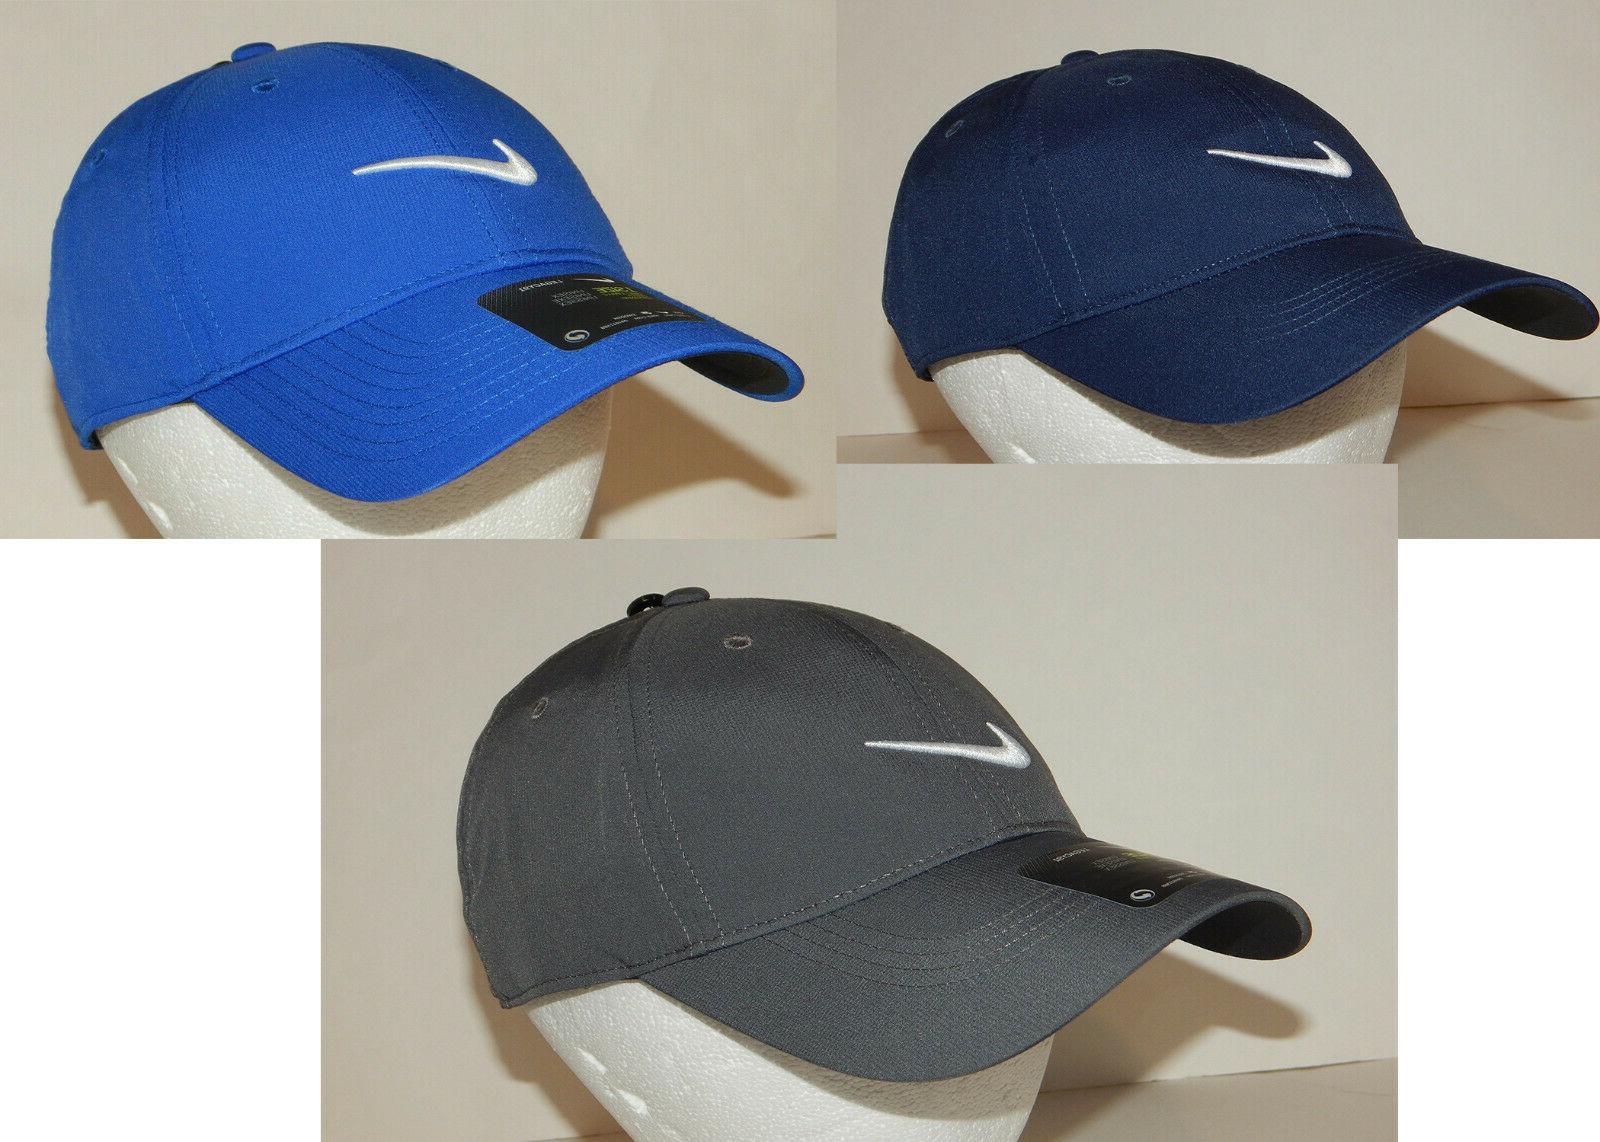 unisex legacy91 cap hat adult strapback golf